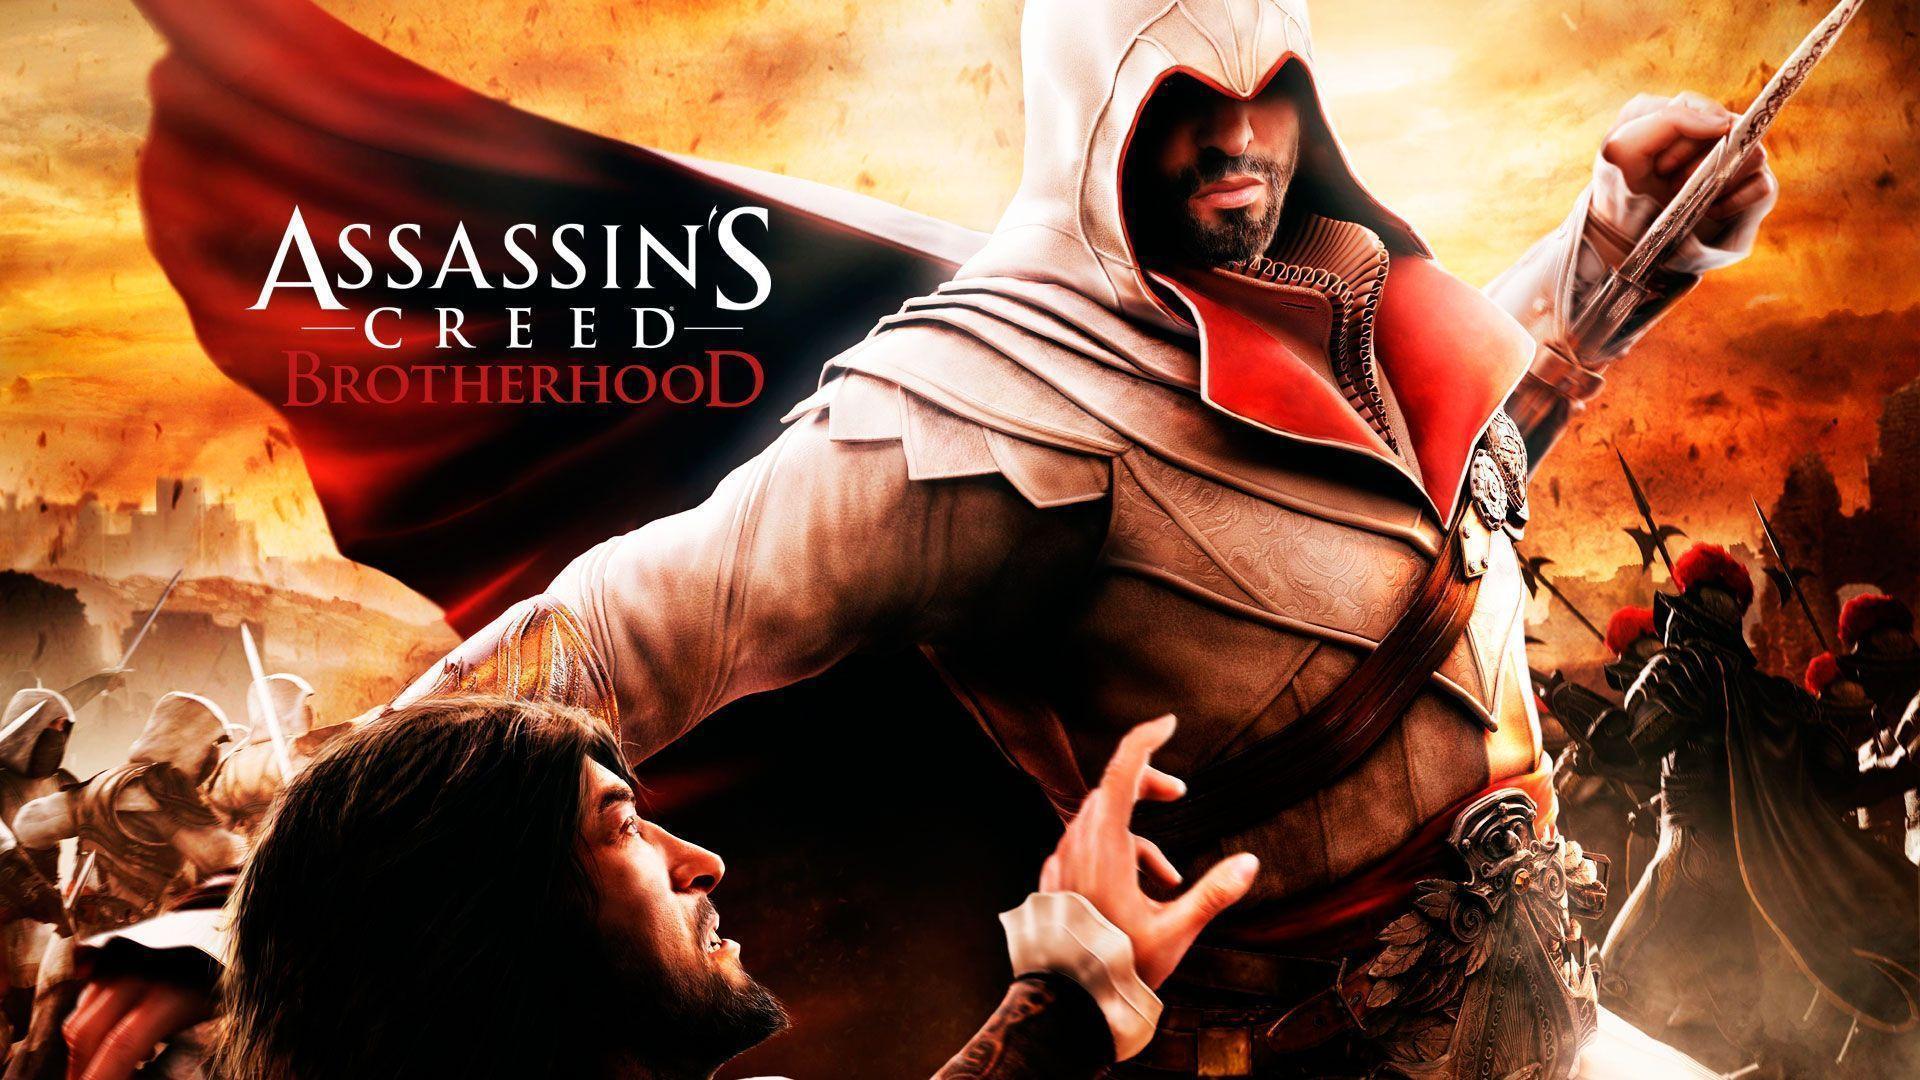 Assassin's Creed Brotherhood 2011 Wallpapers   HD Wallpapers